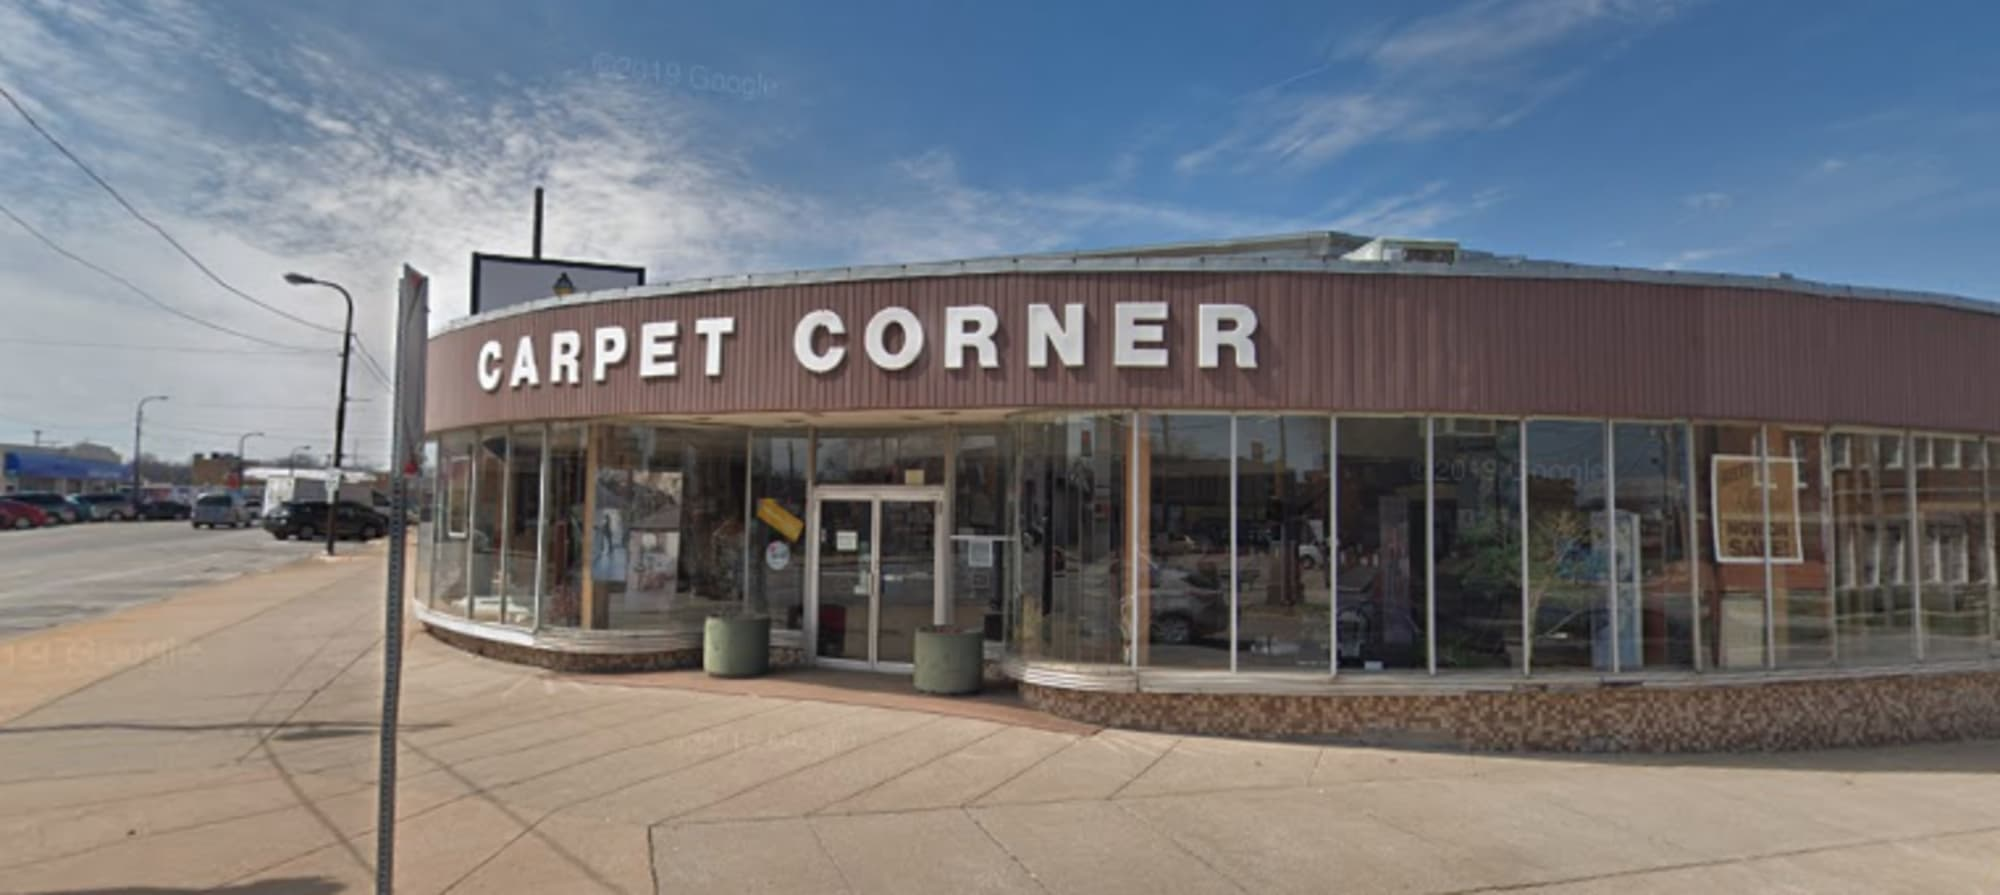 Carpet Corner - 900 Minnesota Ave Kansas City, KS 66101